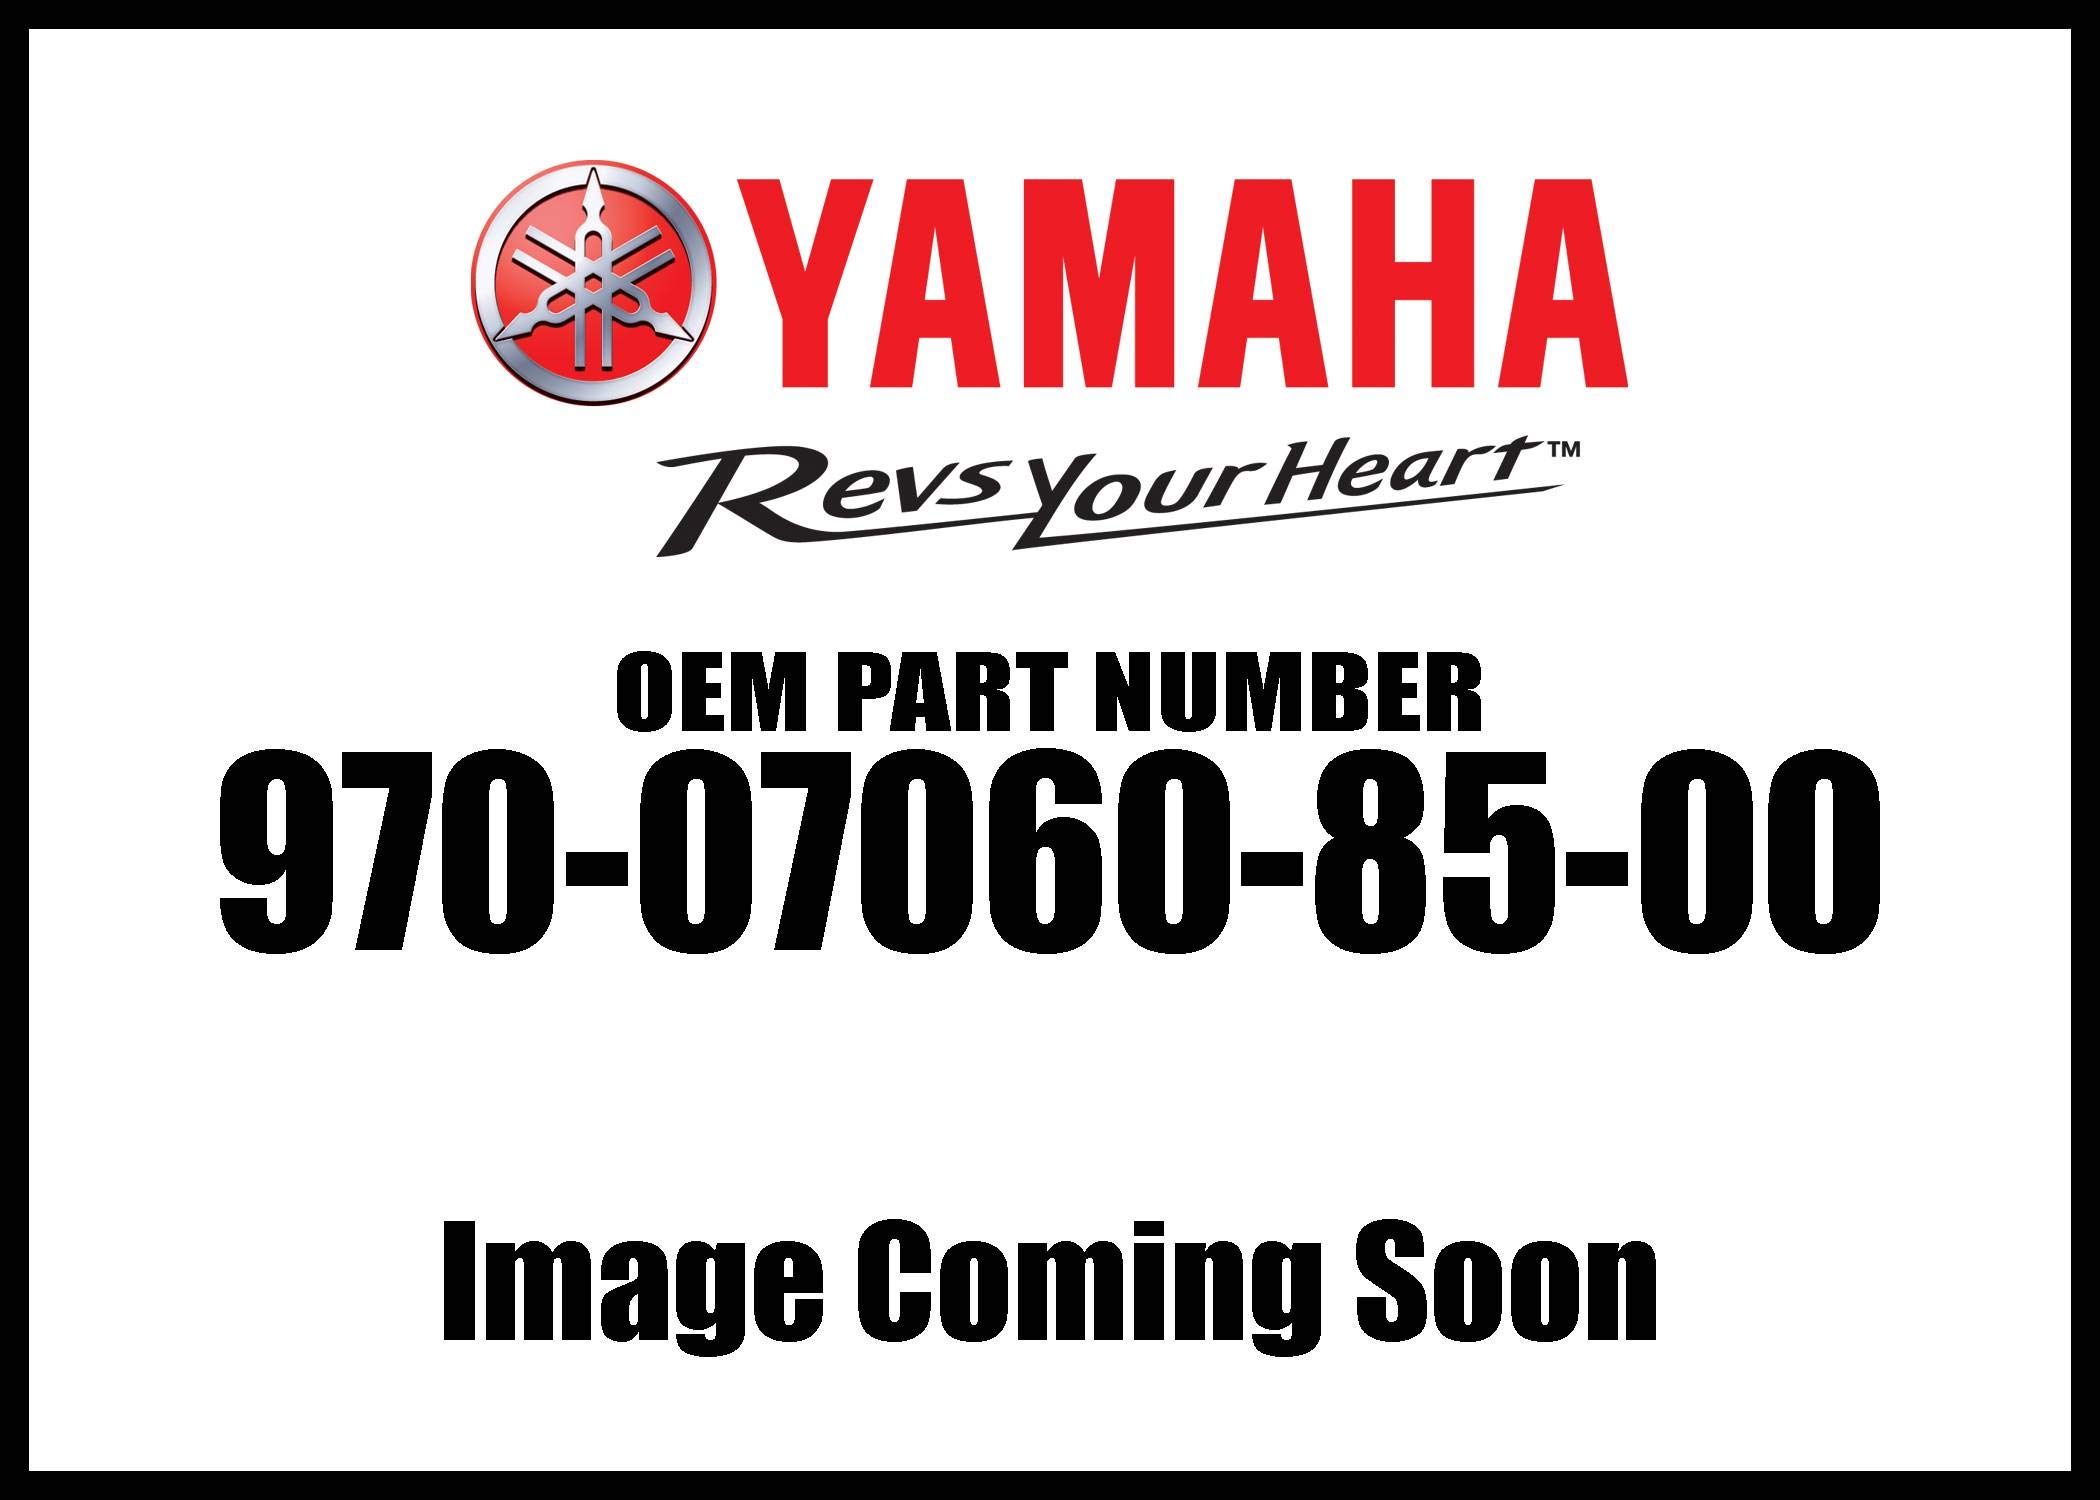 Yamaha Bolt3pt 970-07060-85-00 New Oem